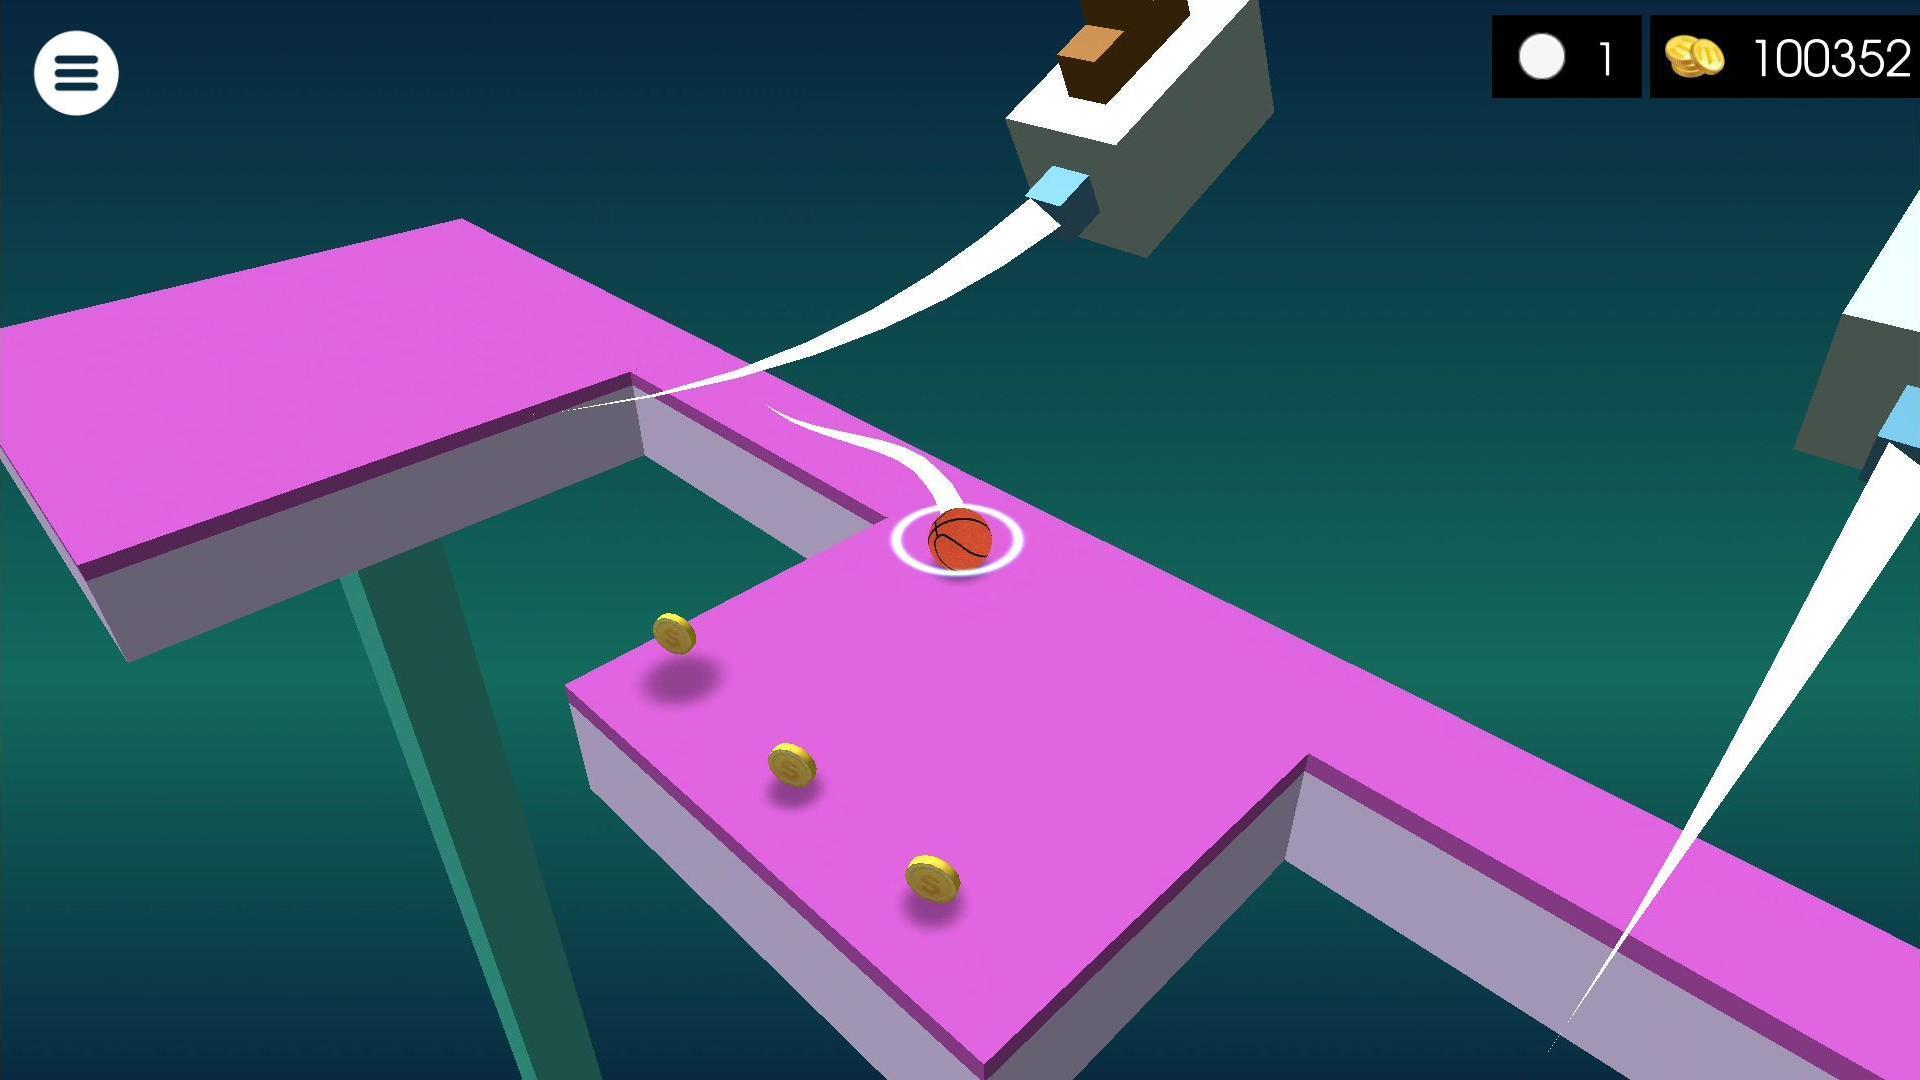 RYWO free 3D roll ball game 1.2.3 Screenshot 19